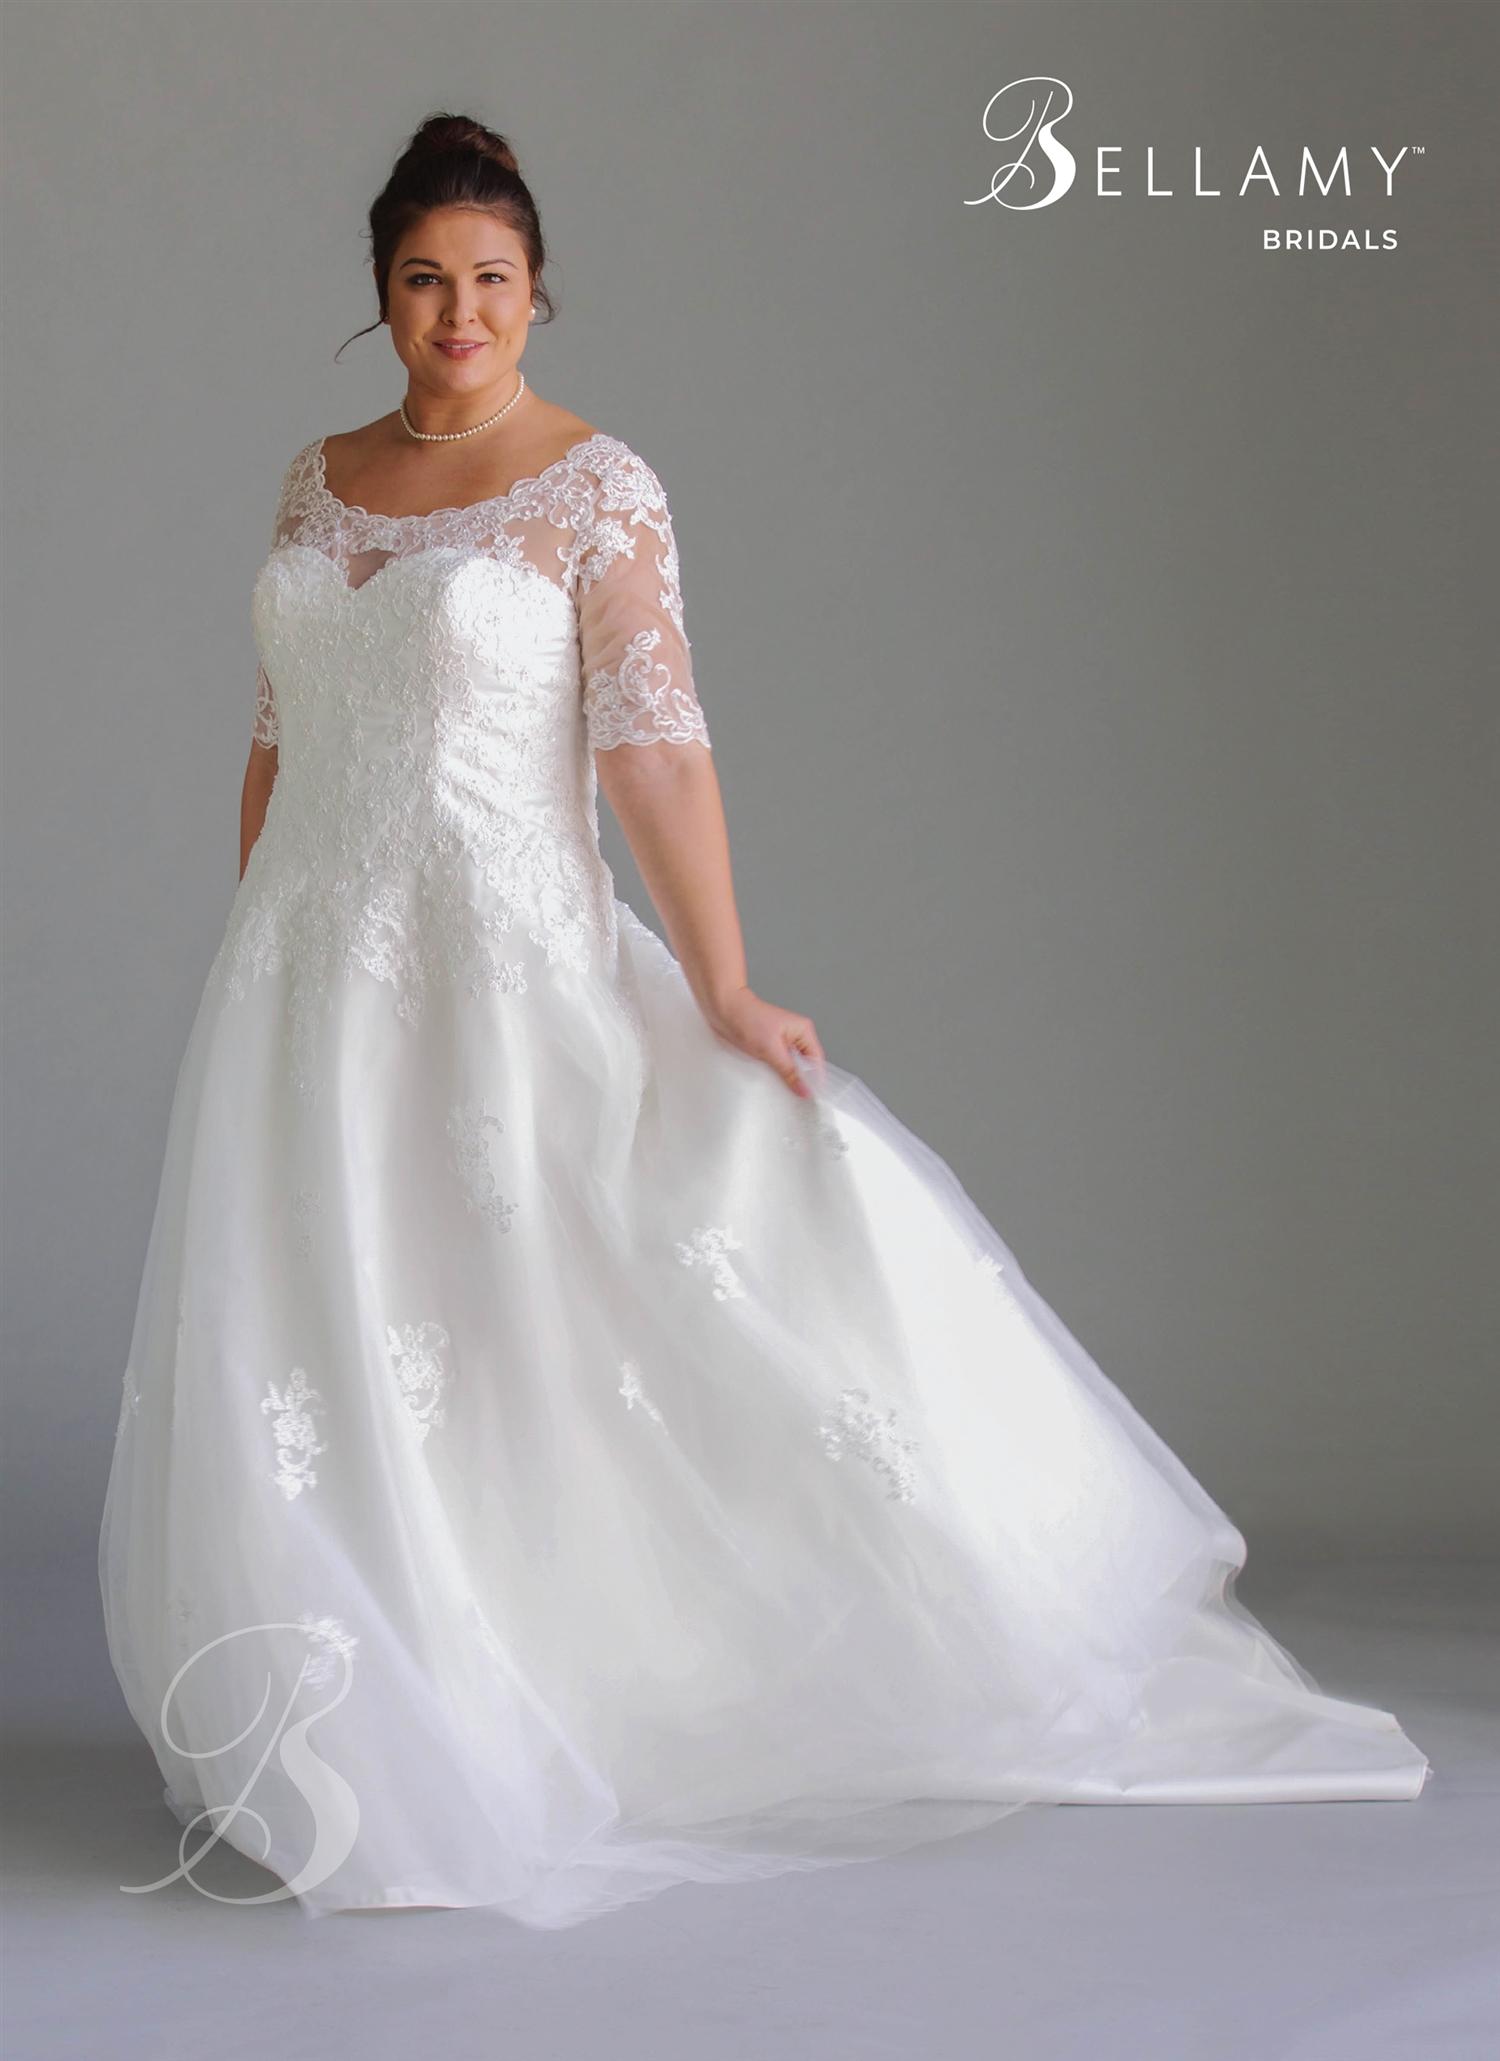 Lace Plus Size Bridal Dress at Brilliant Bridal